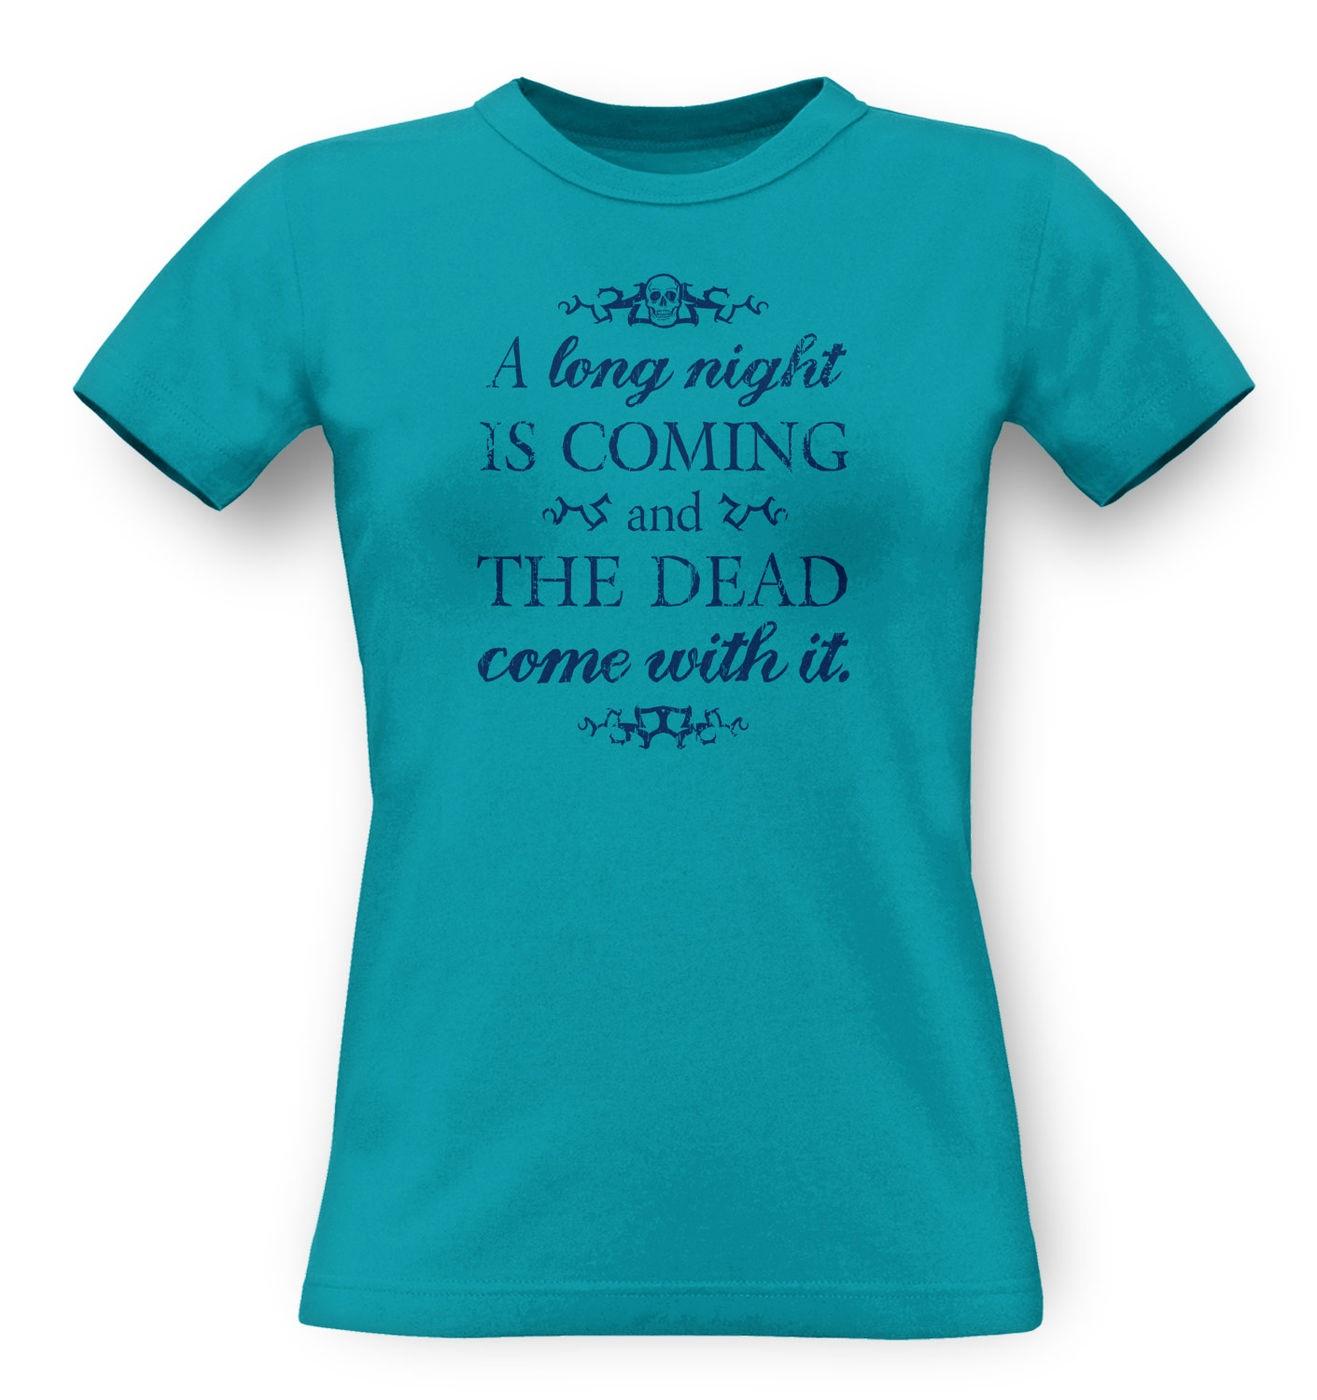 A Long Night classic womens t-shirt by Something Geeky